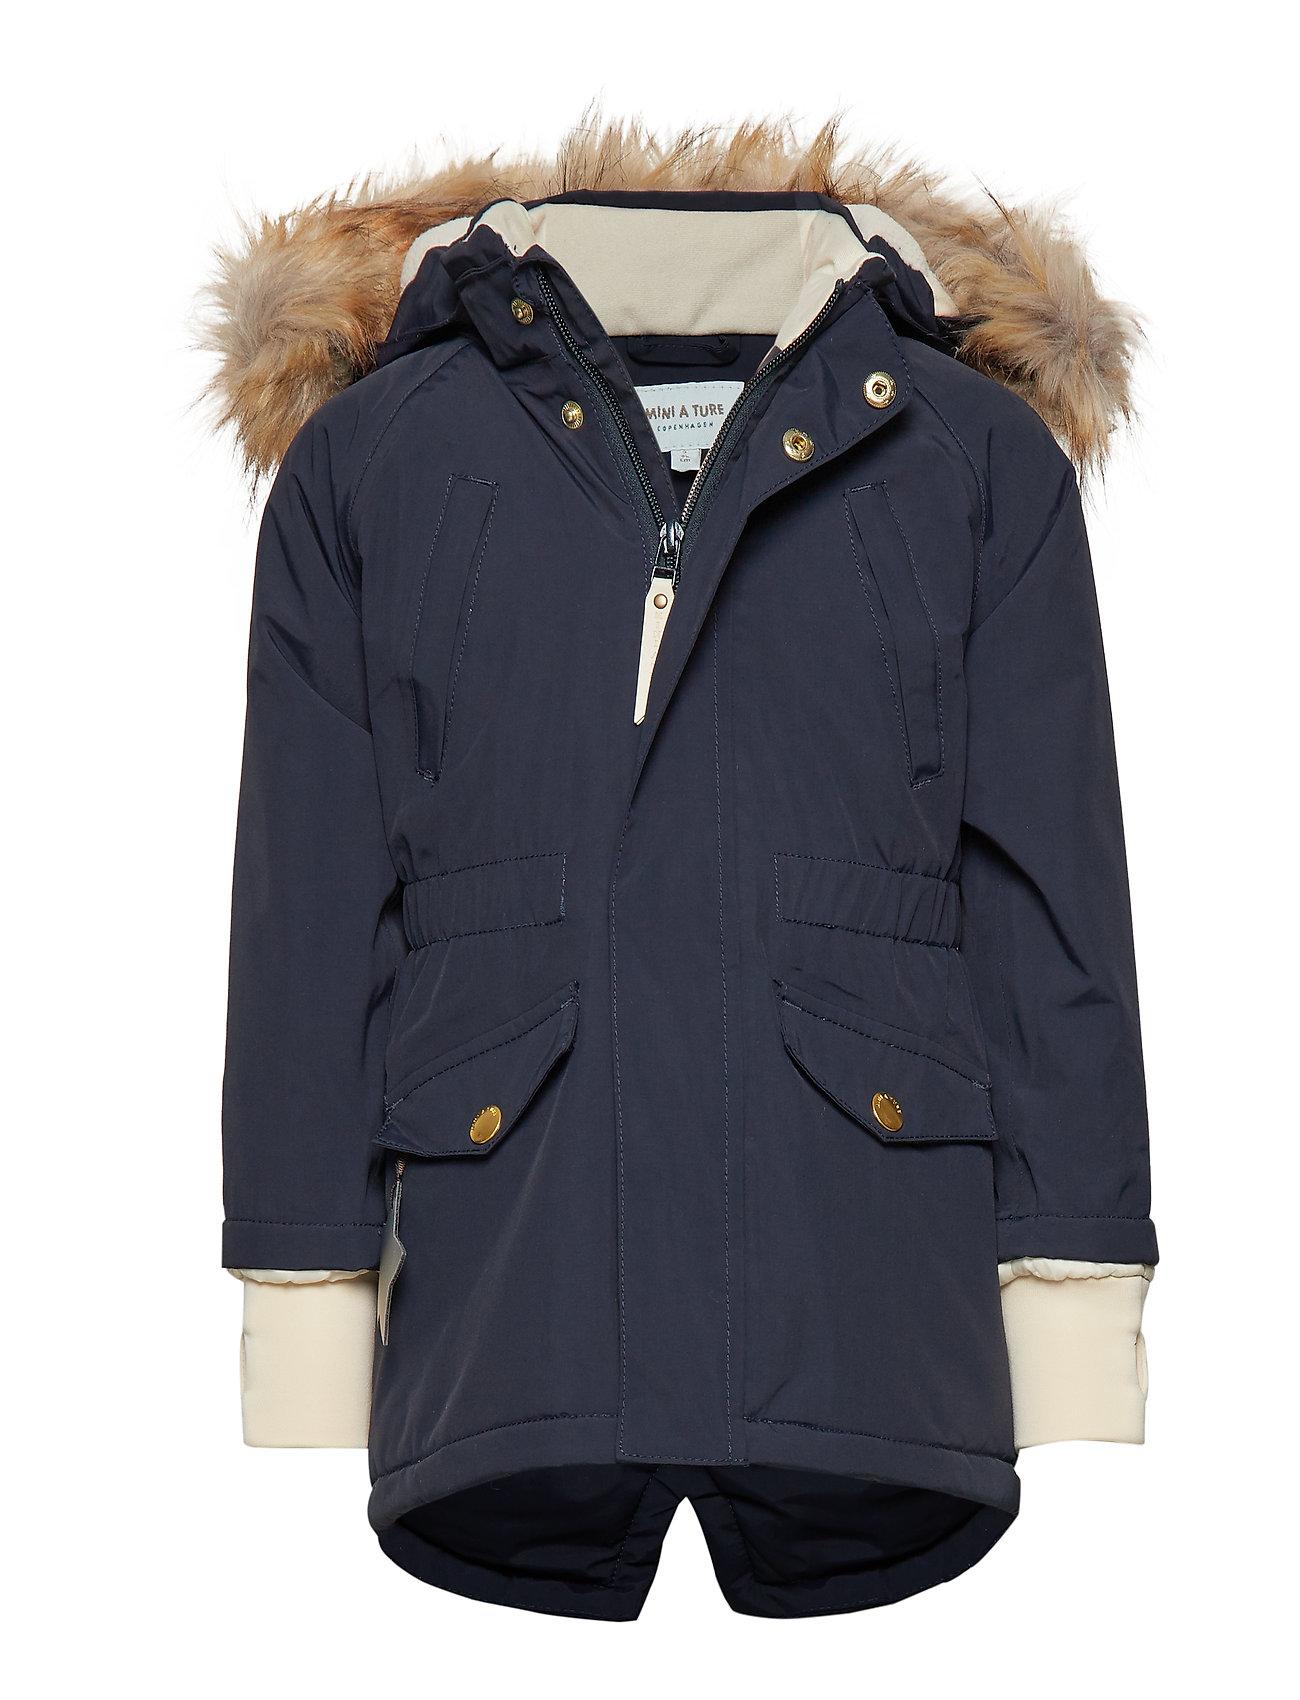 Mini A Ture Vibse Faux Fur Jacket, K - SKY CAPTAIN BLUE